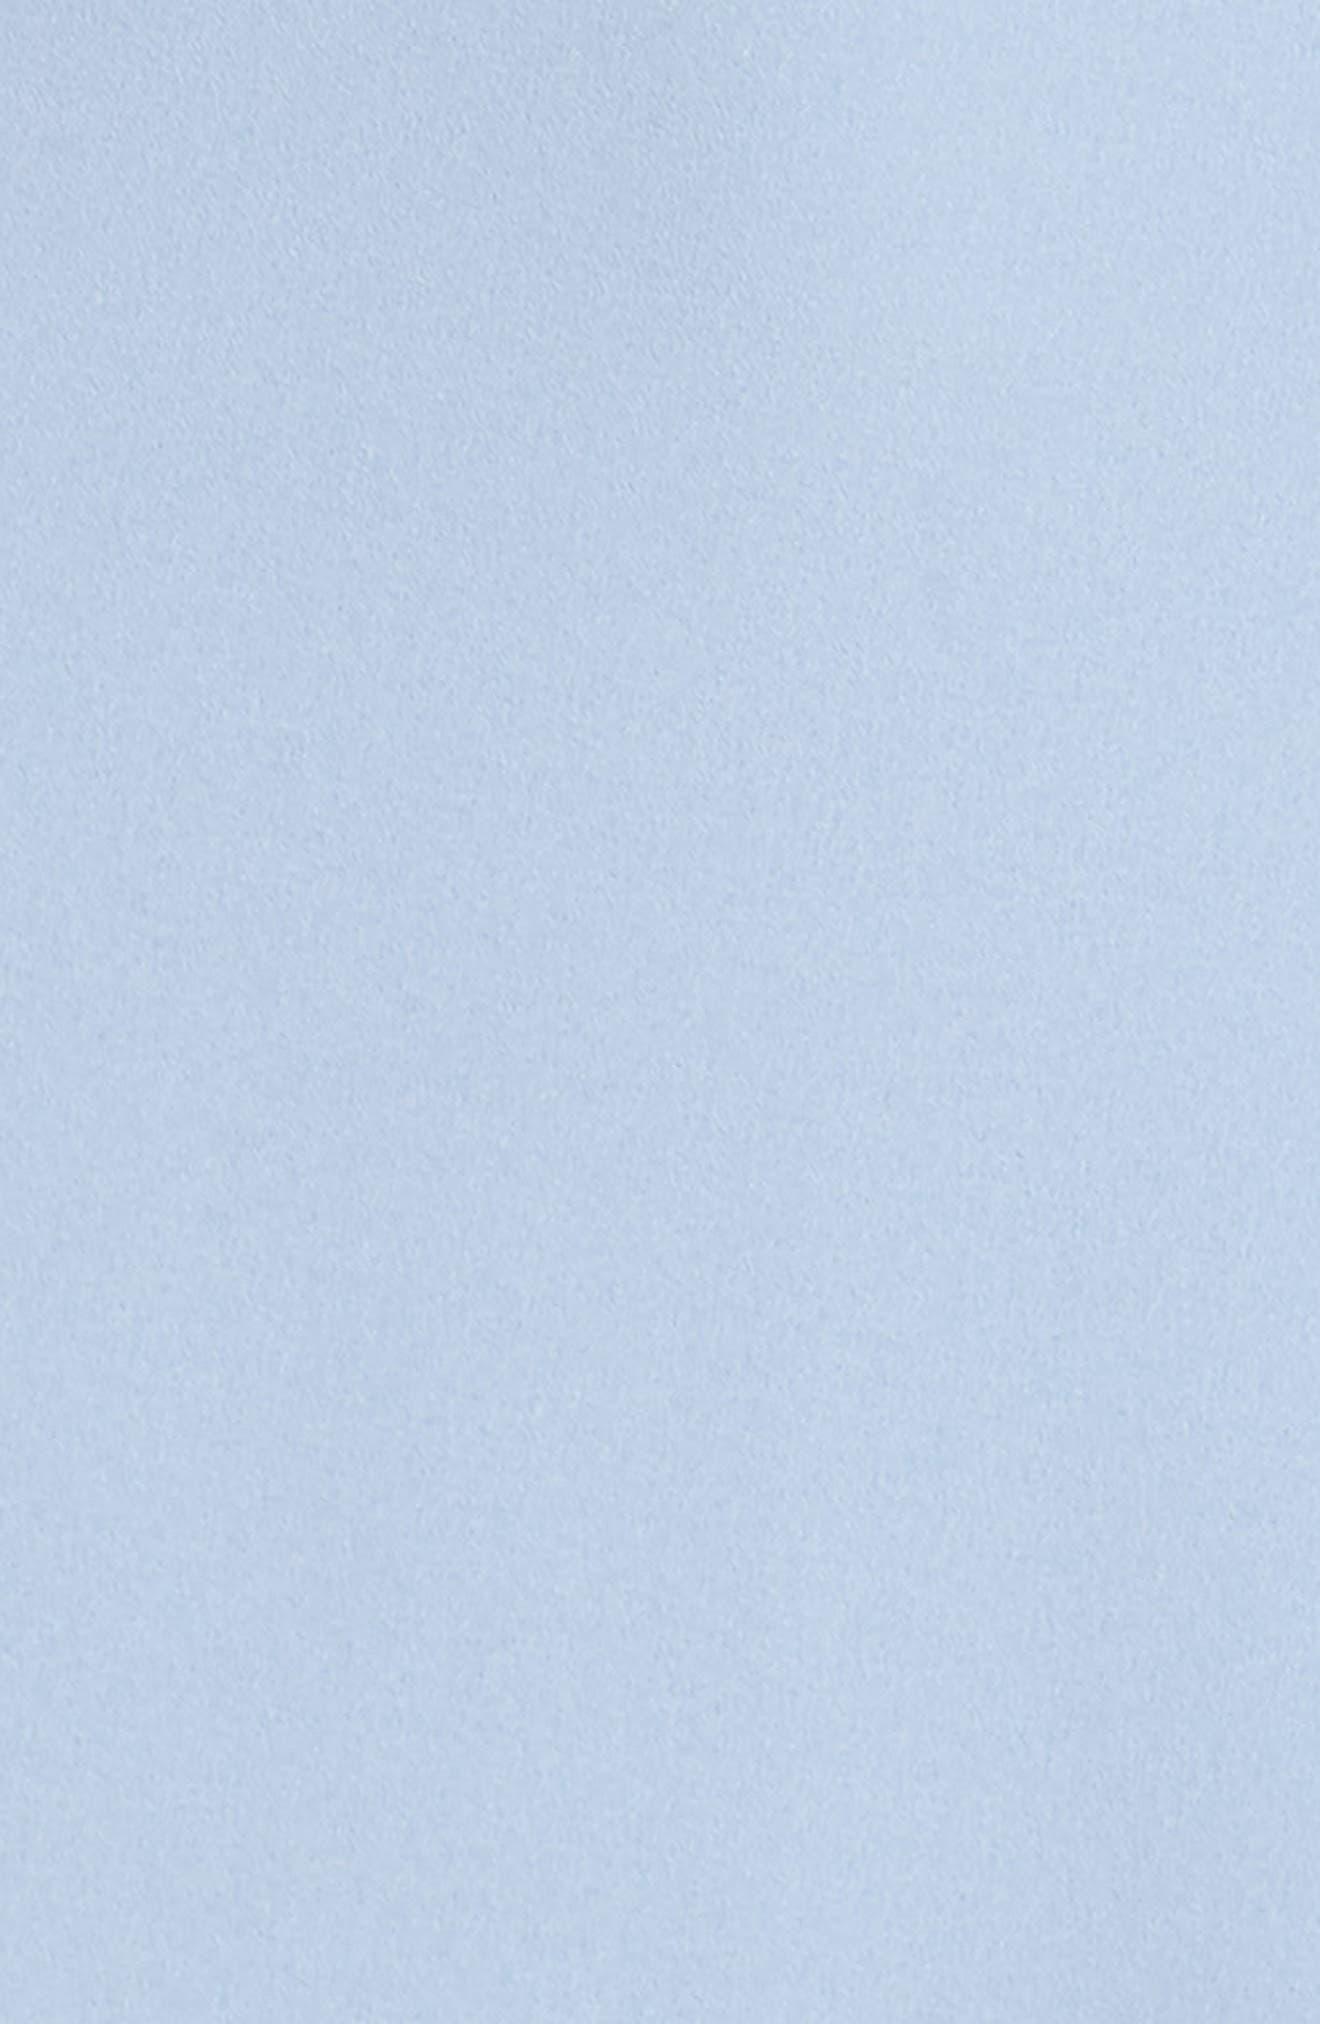 ALI & JAY, Terrace Time Asymmetrical Maxi Dress, Alternate thumbnail 6, color, 400